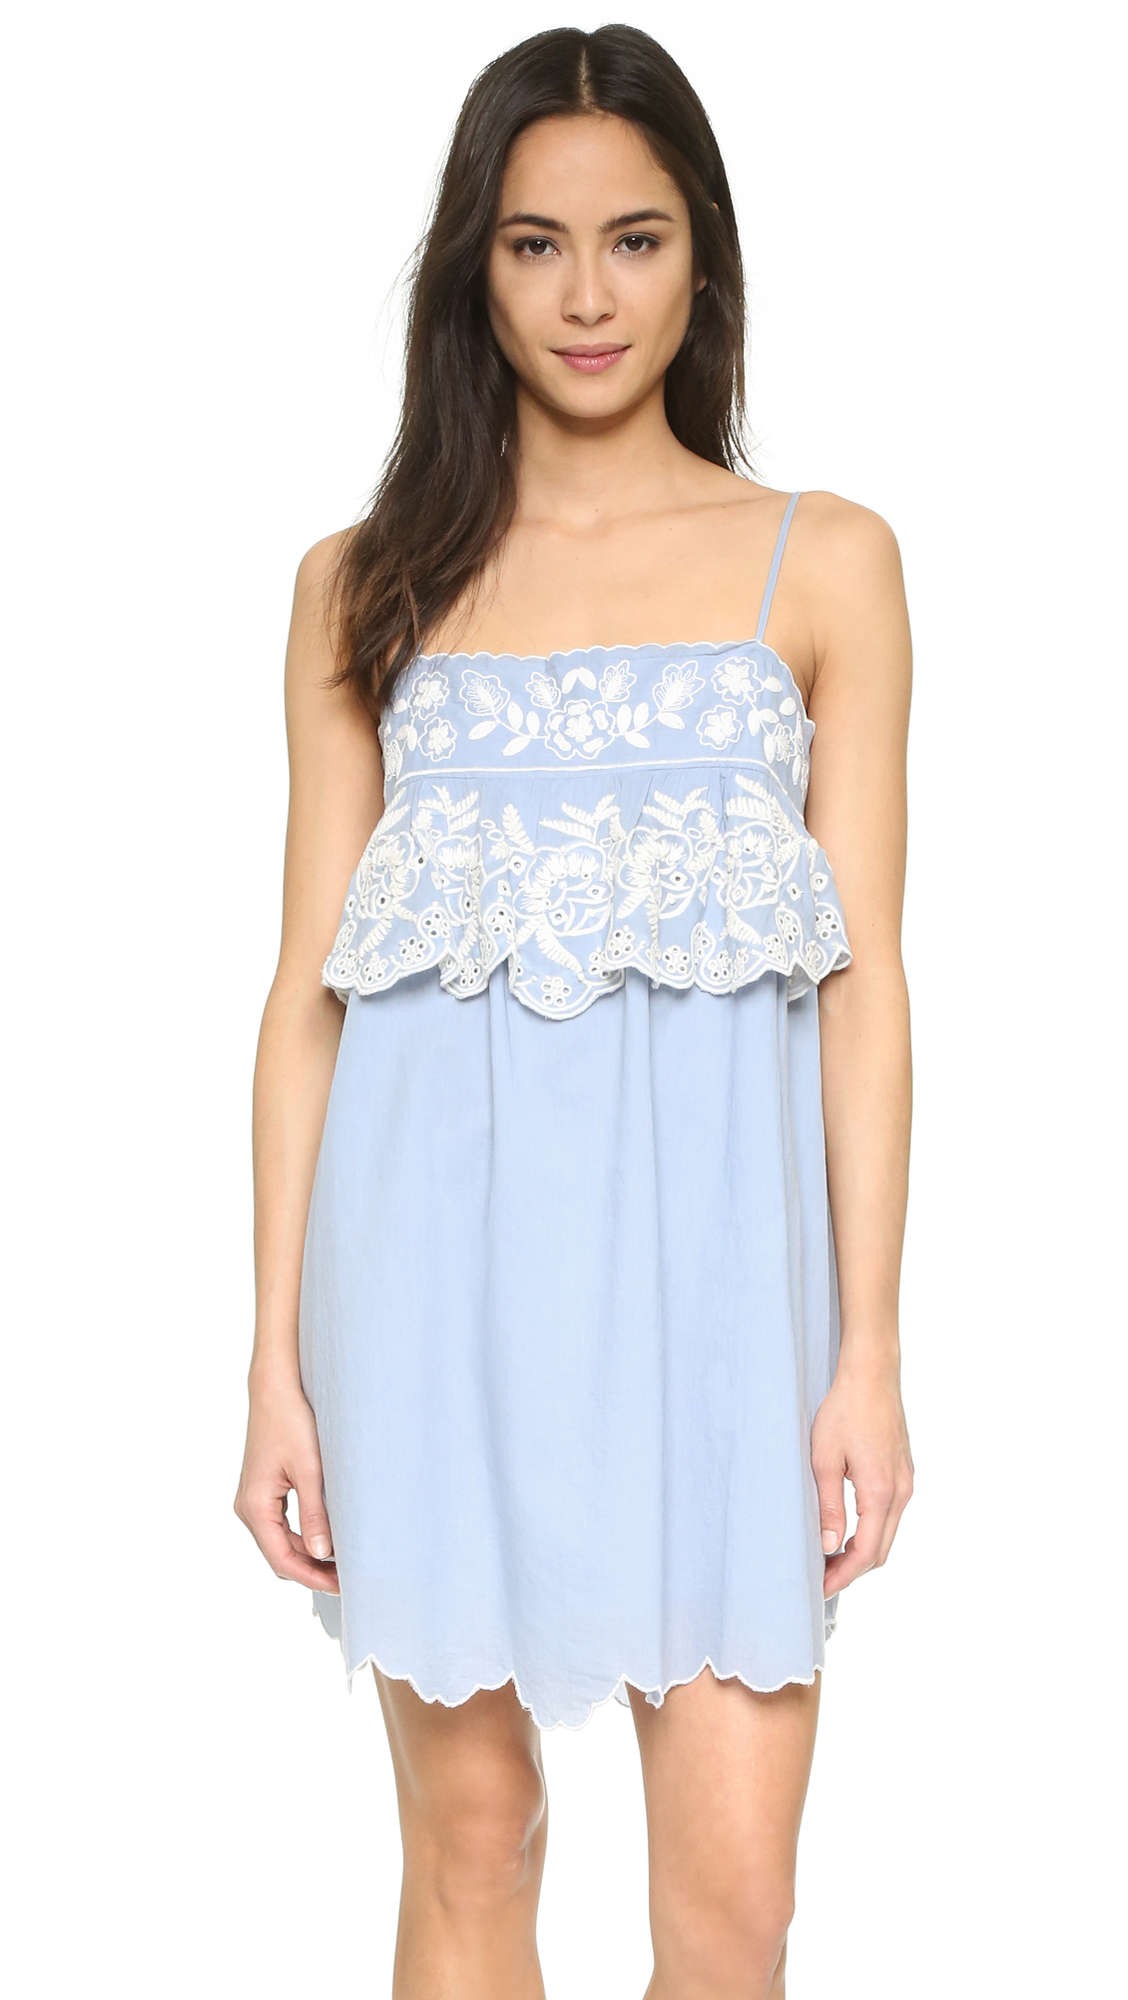 Love Sam Seraphina Dress - Chambray/Ivory at Shopbop